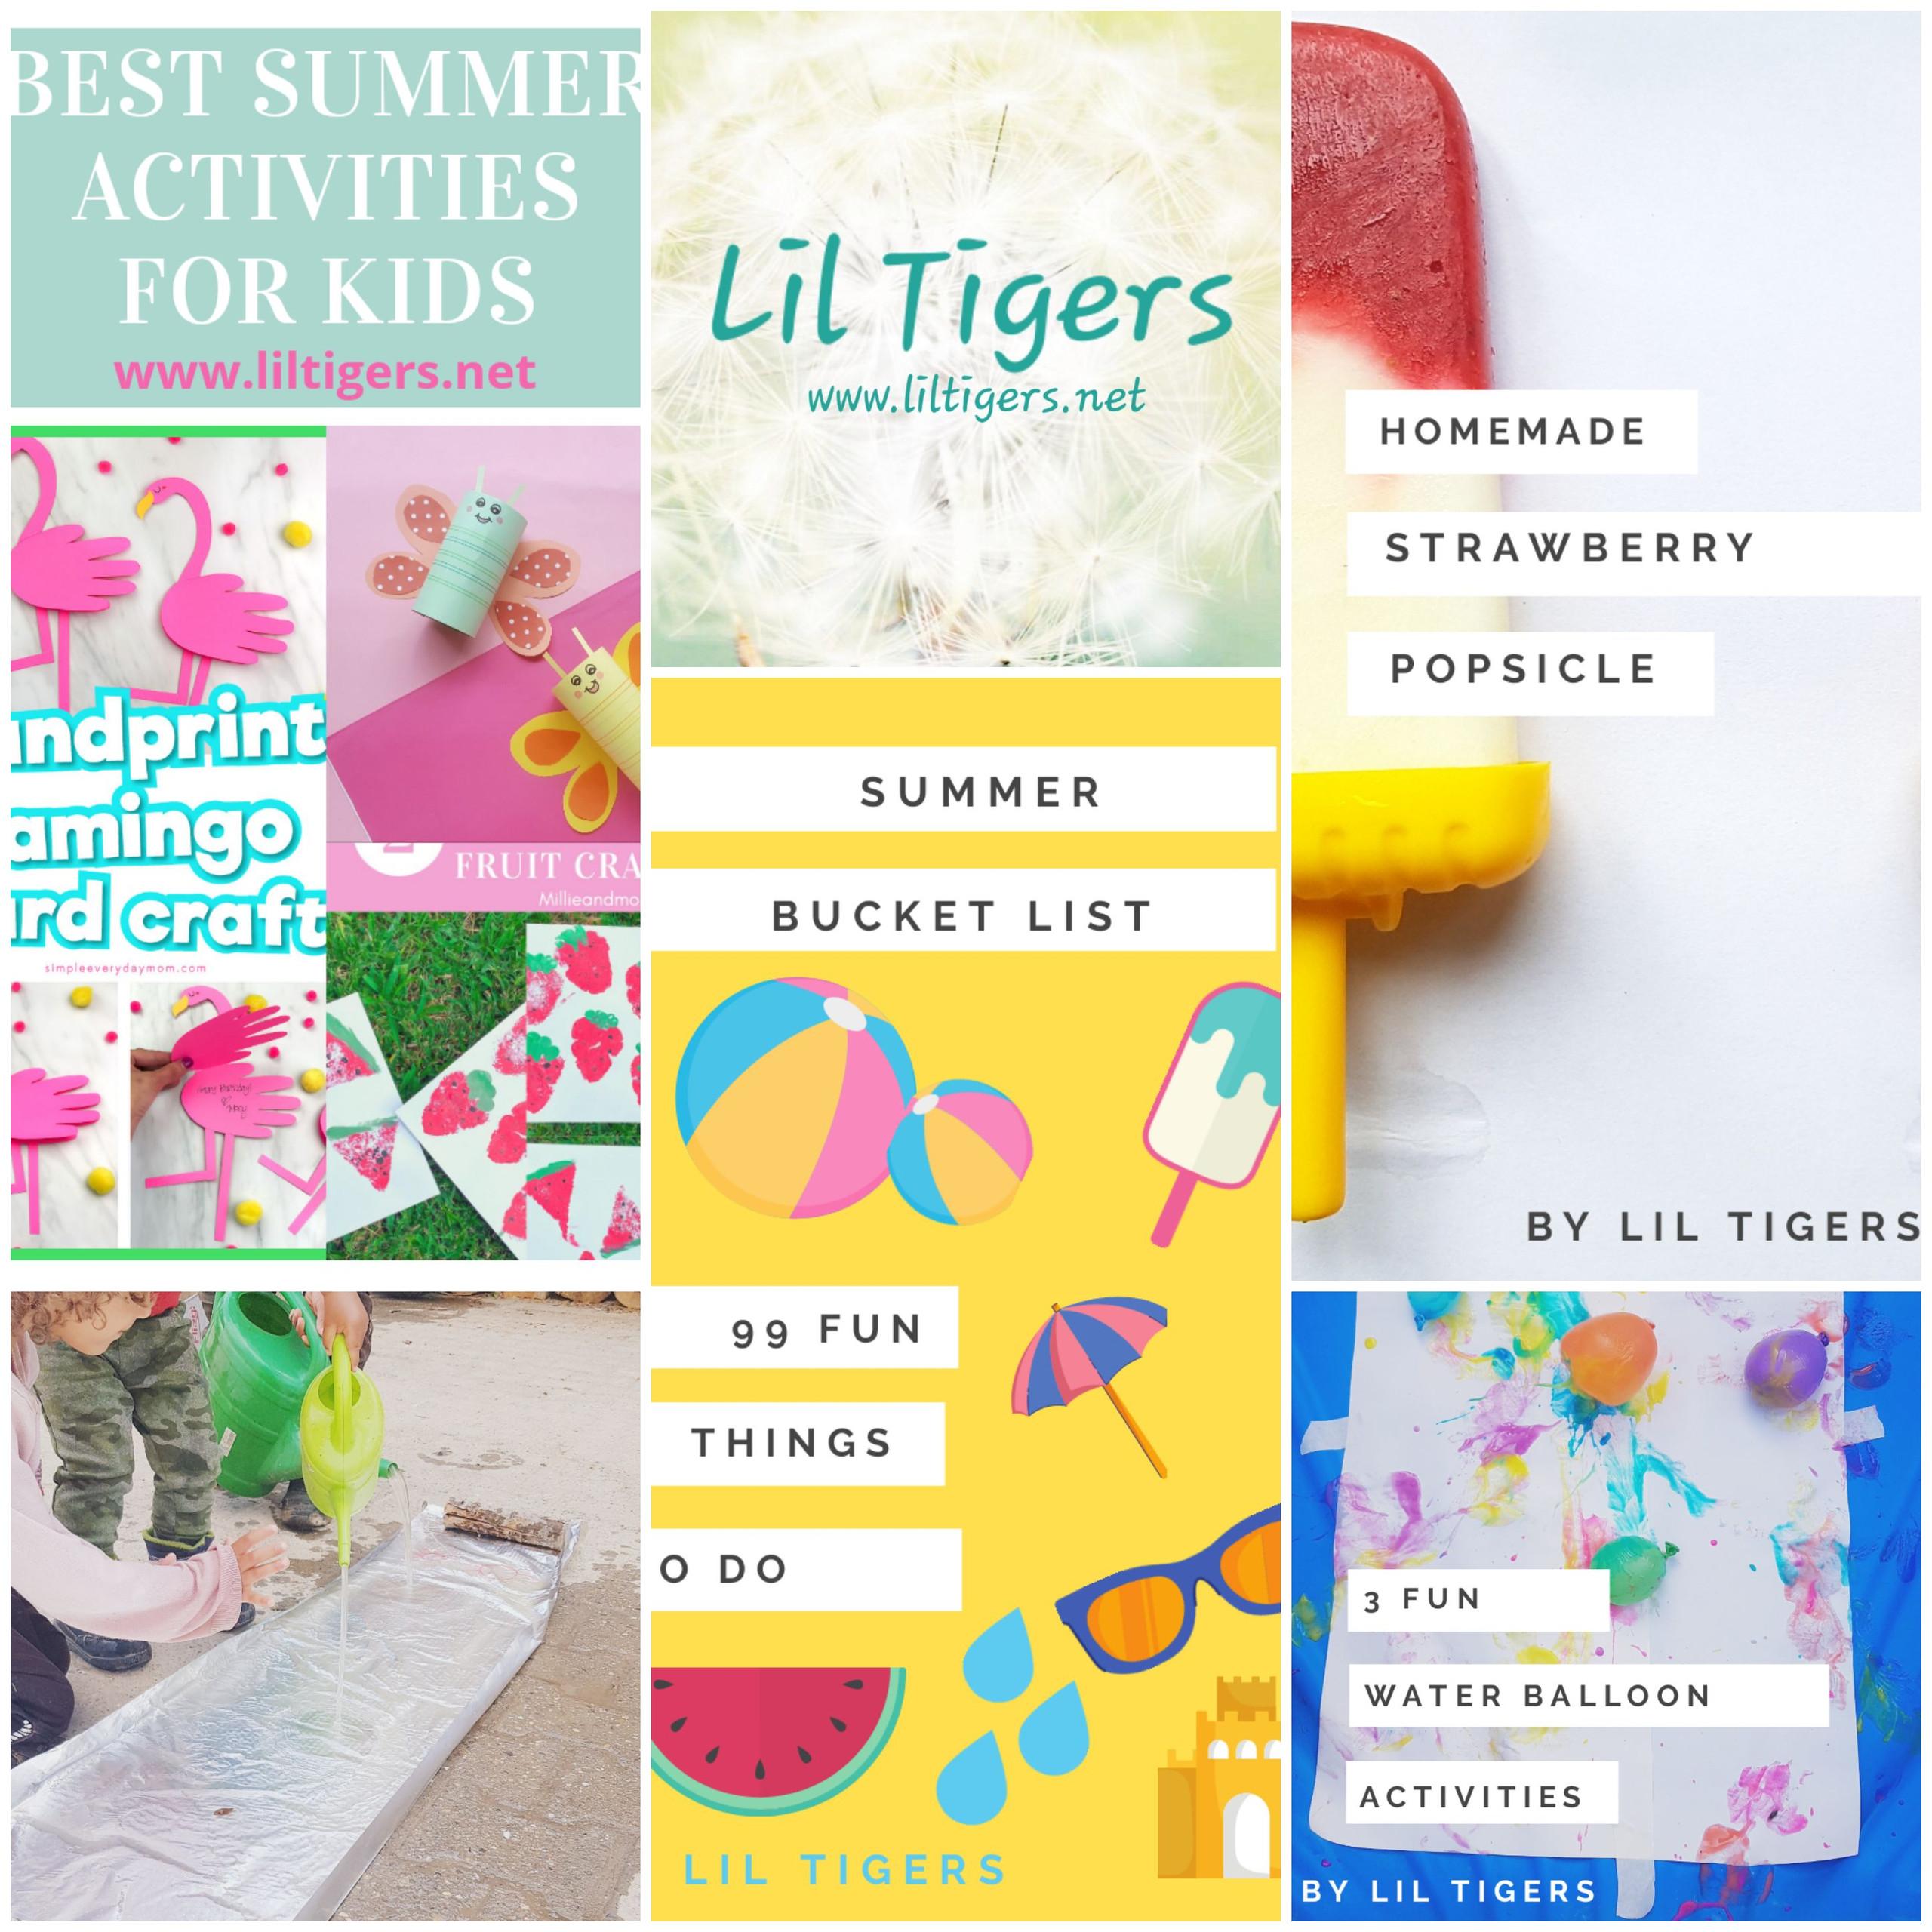 Summer Activities for little Tigers